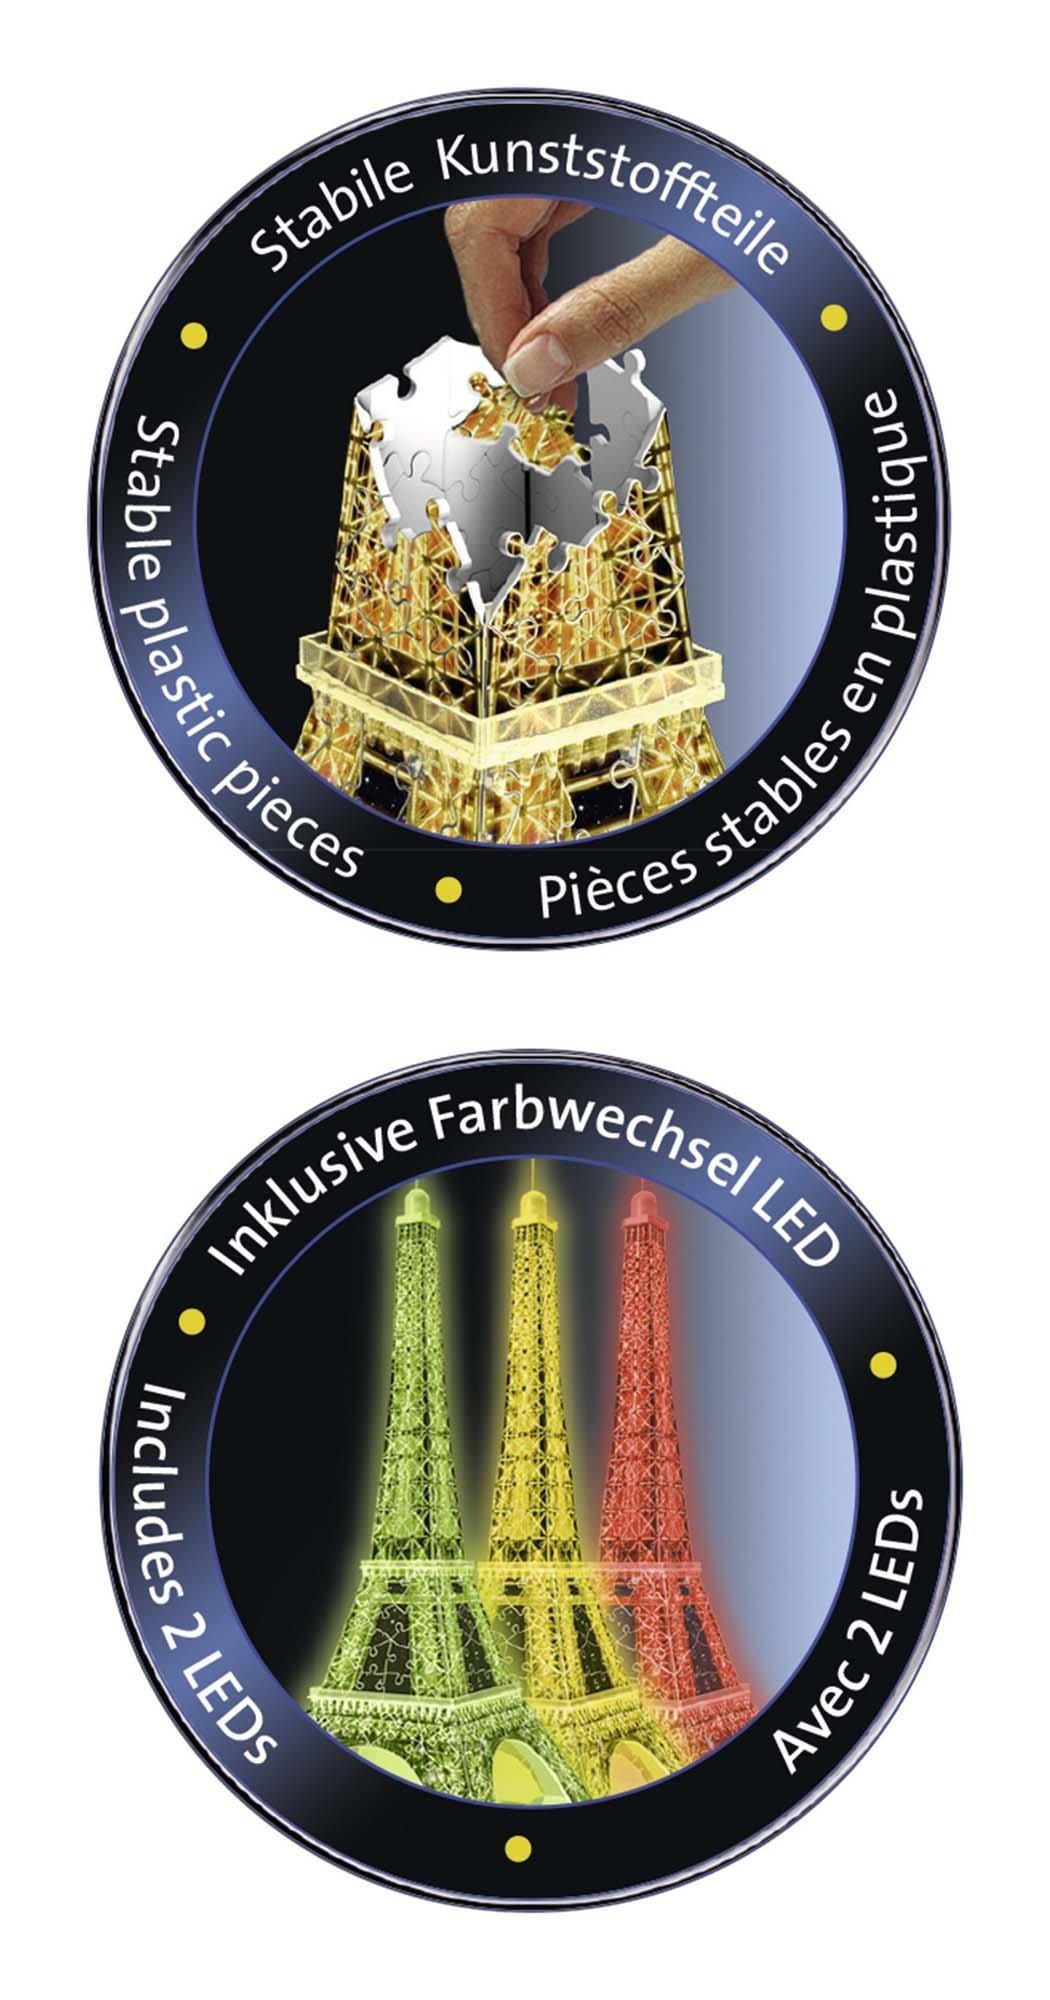 Ravensburger- Tour Torre Eiffel Puzzle 3D con LED, Edizione Speciale Notte, 216 Pezzi, Multicolore, 12579 4 spesavip